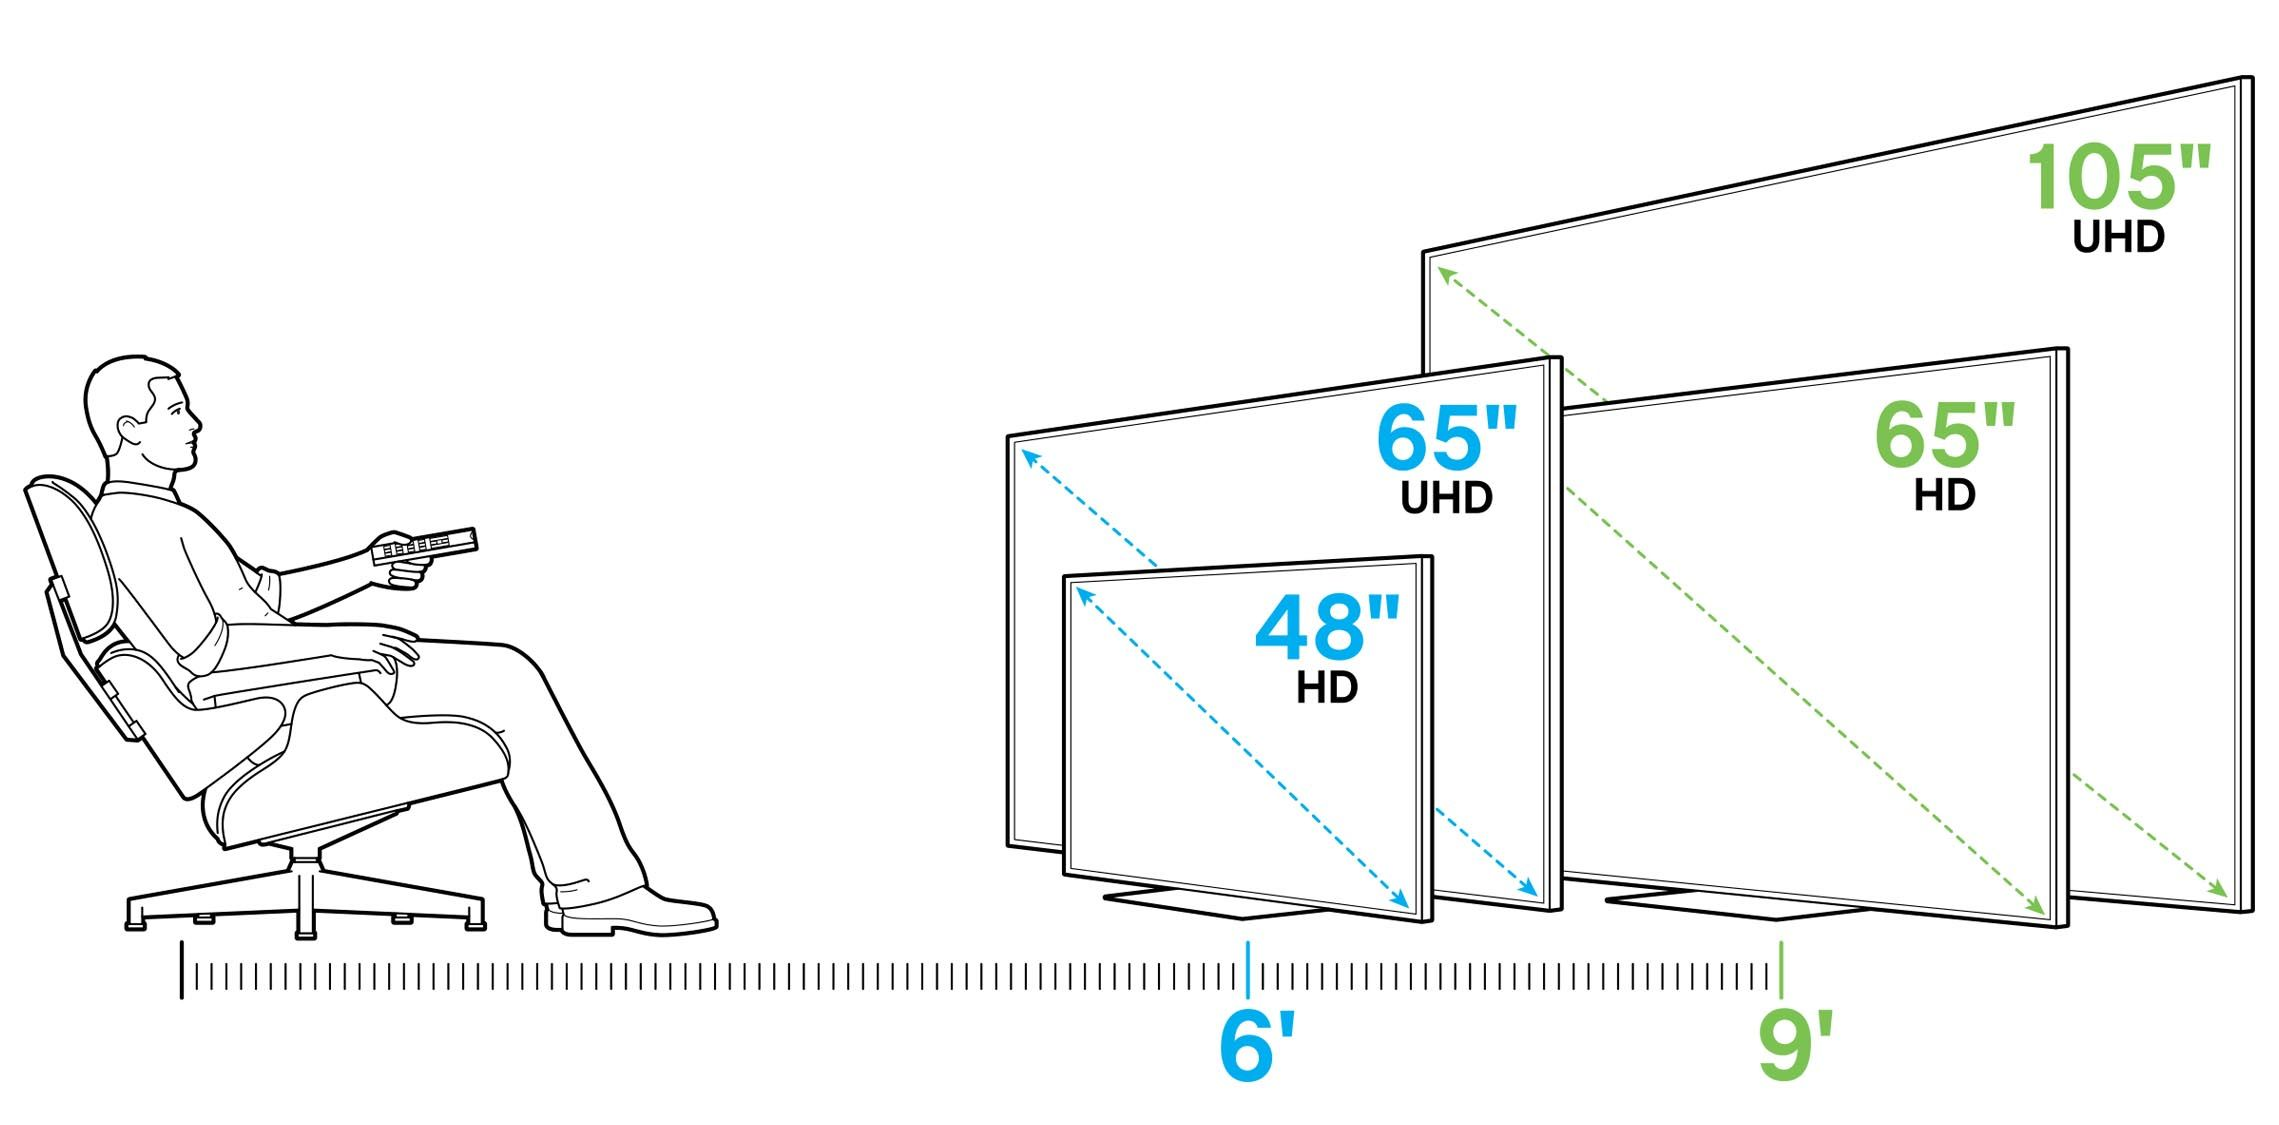 tv buying guide tv addict pinterest tv distance 80 inch tvs and 65 inch tvs. Black Bedroom Furniture Sets. Home Design Ideas